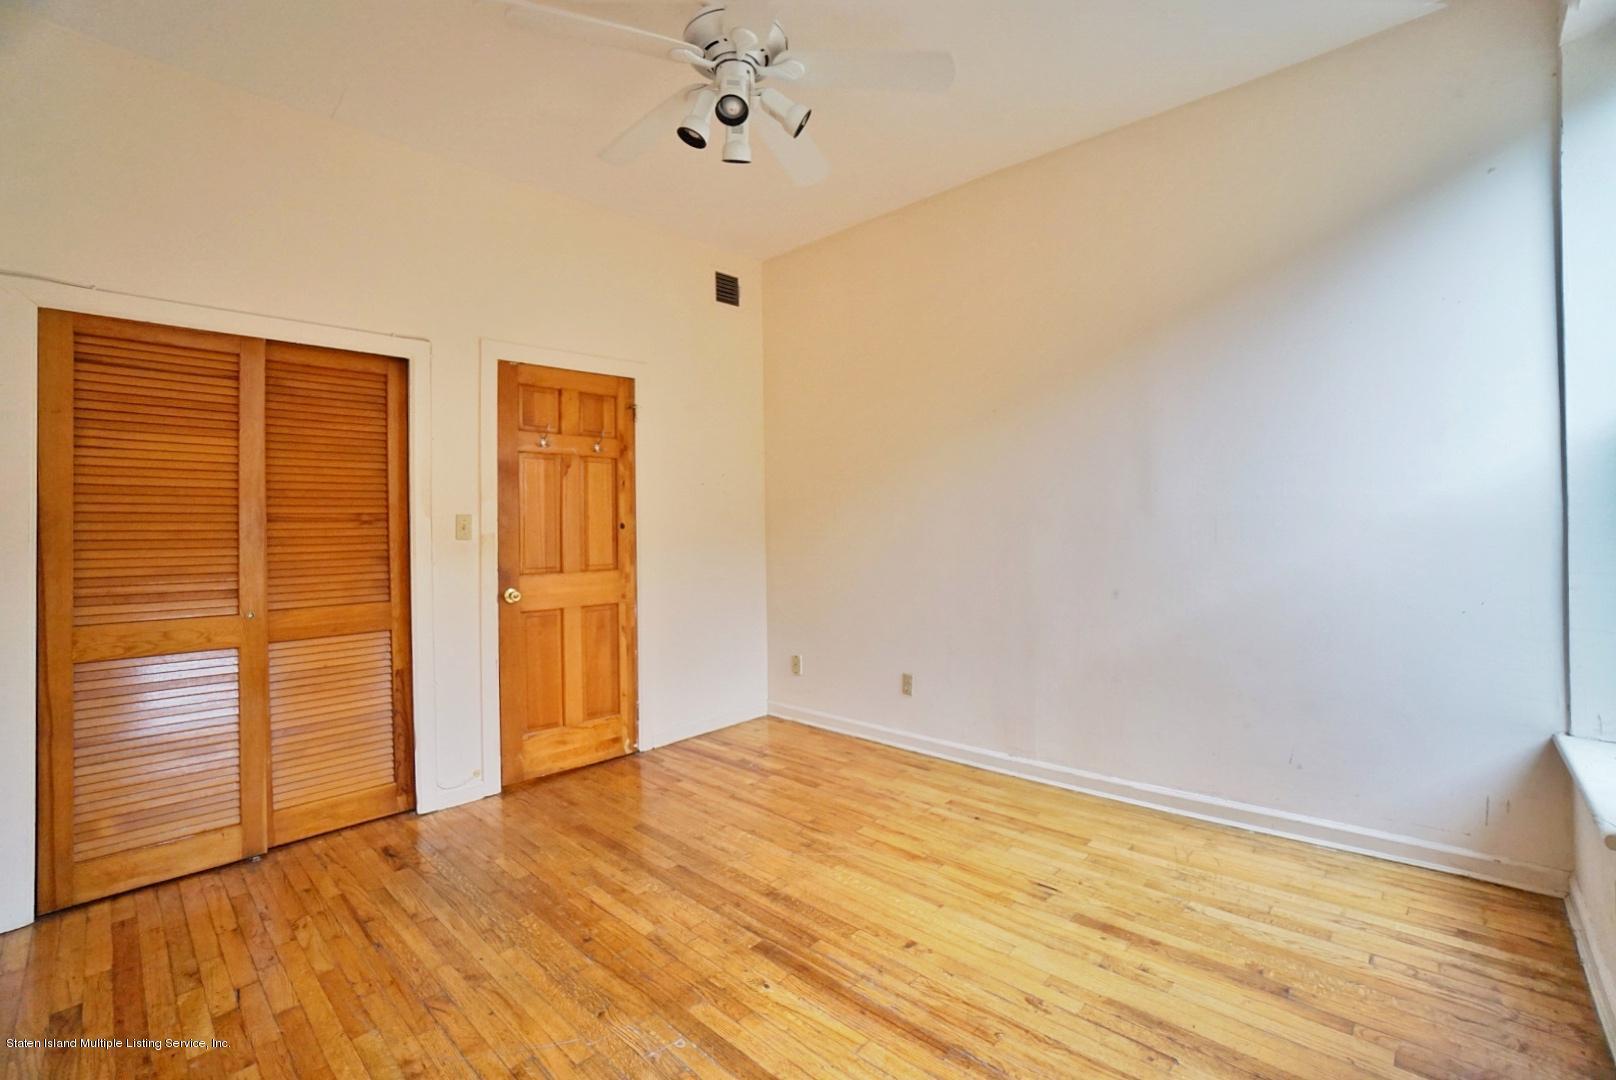 4l 103 4 Avenue,Brooklyn,New York,11217,United States,1 Bedroom Bedrooms,3 Rooms Rooms,1 BathroomBathrooms,Residential,4,1133889